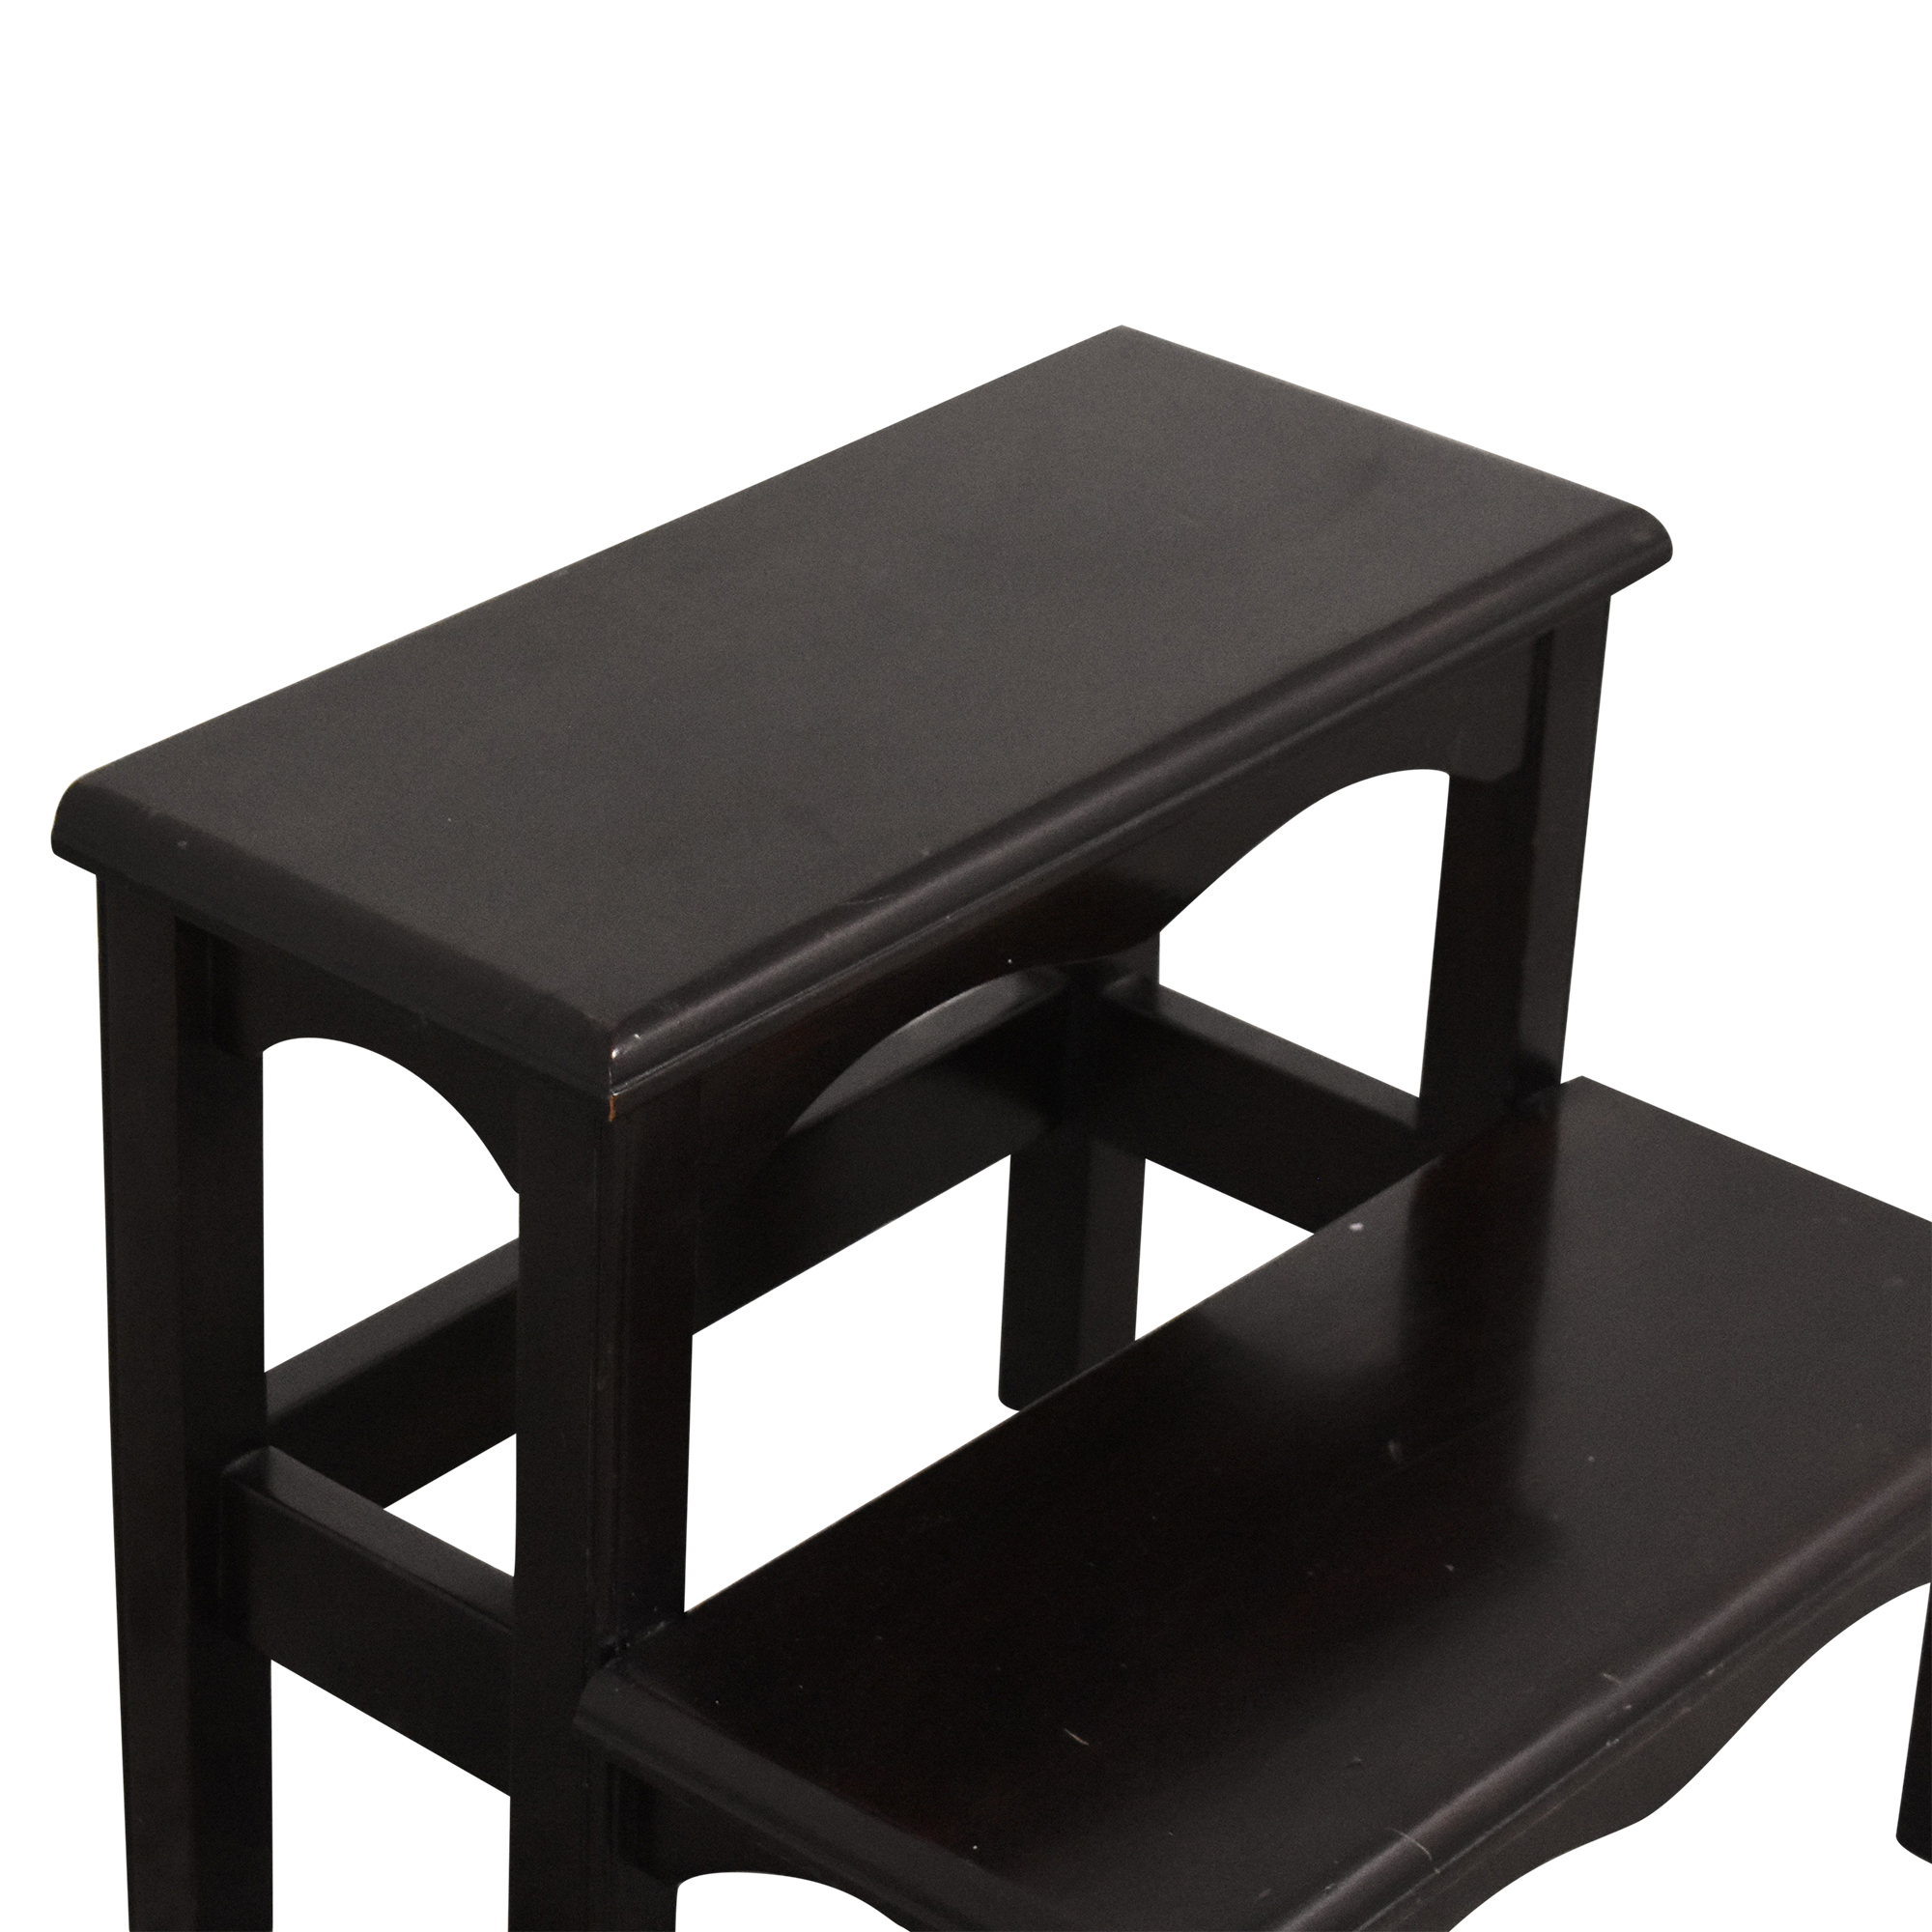 Stickley Furniture Step Stool / Decorative Accents